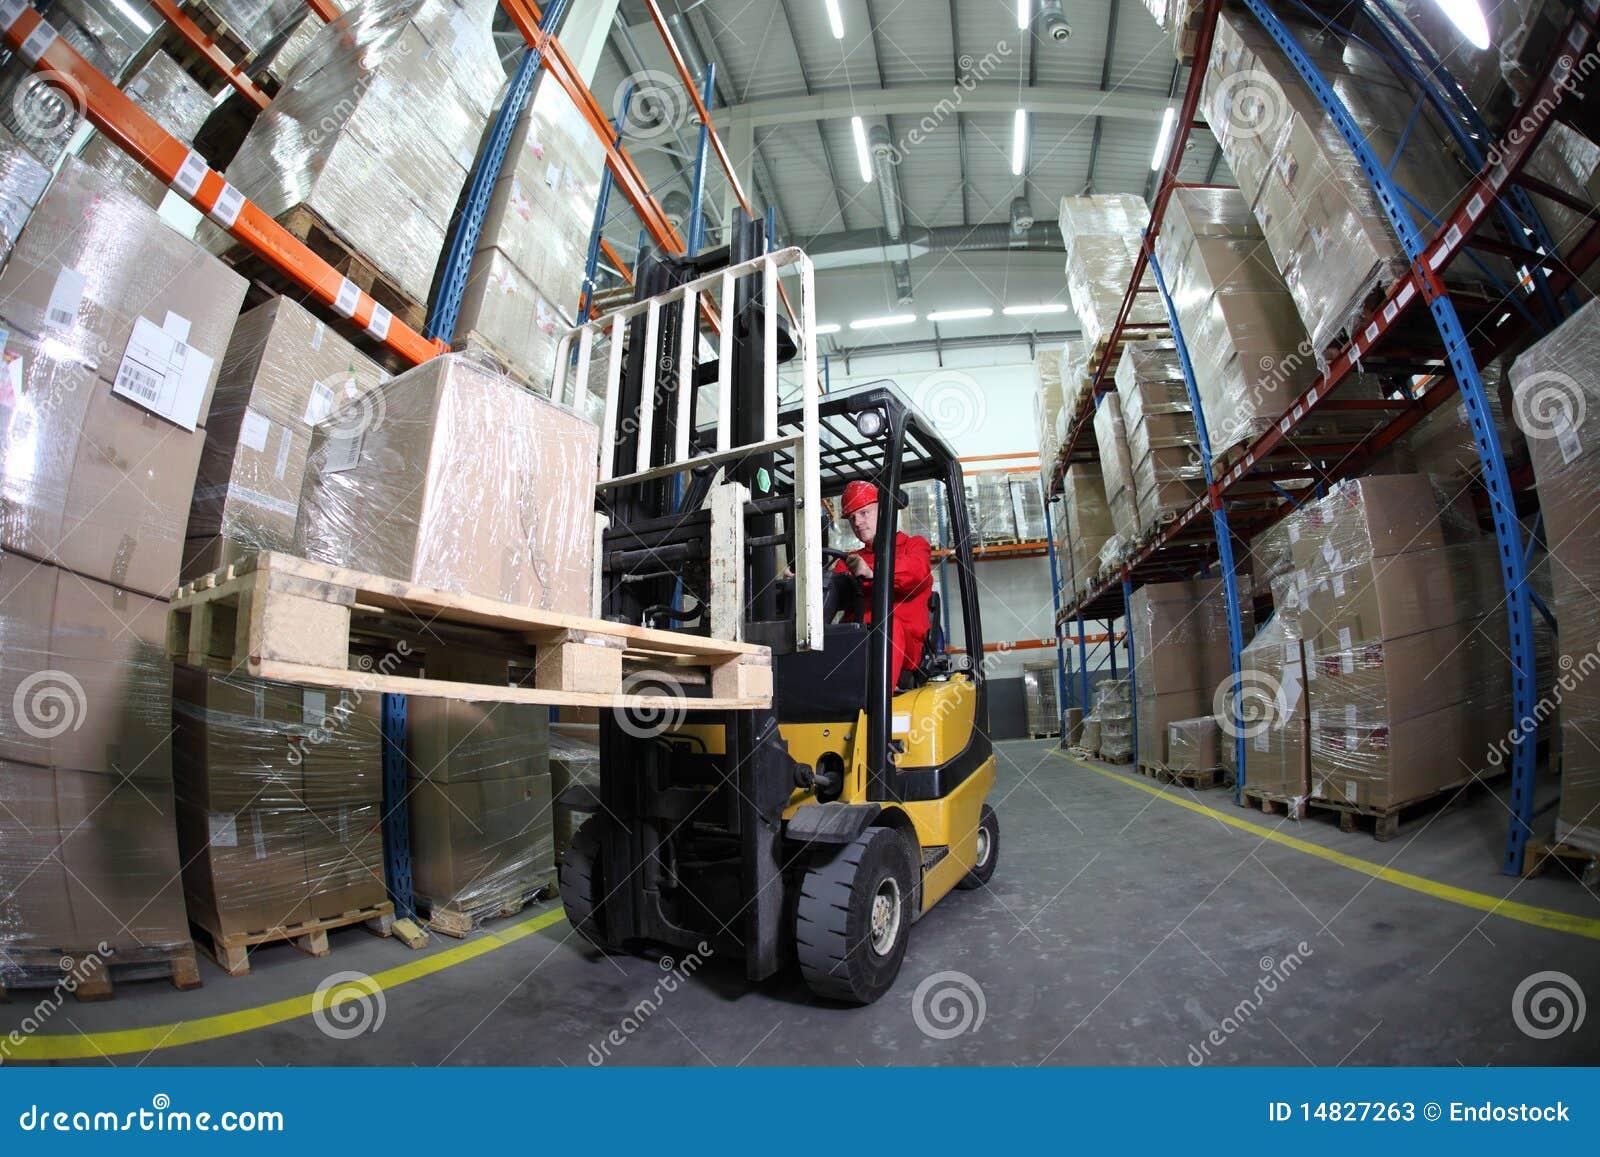 Warehouse Forklift Operator Forklift Resume Design Warehouse ...